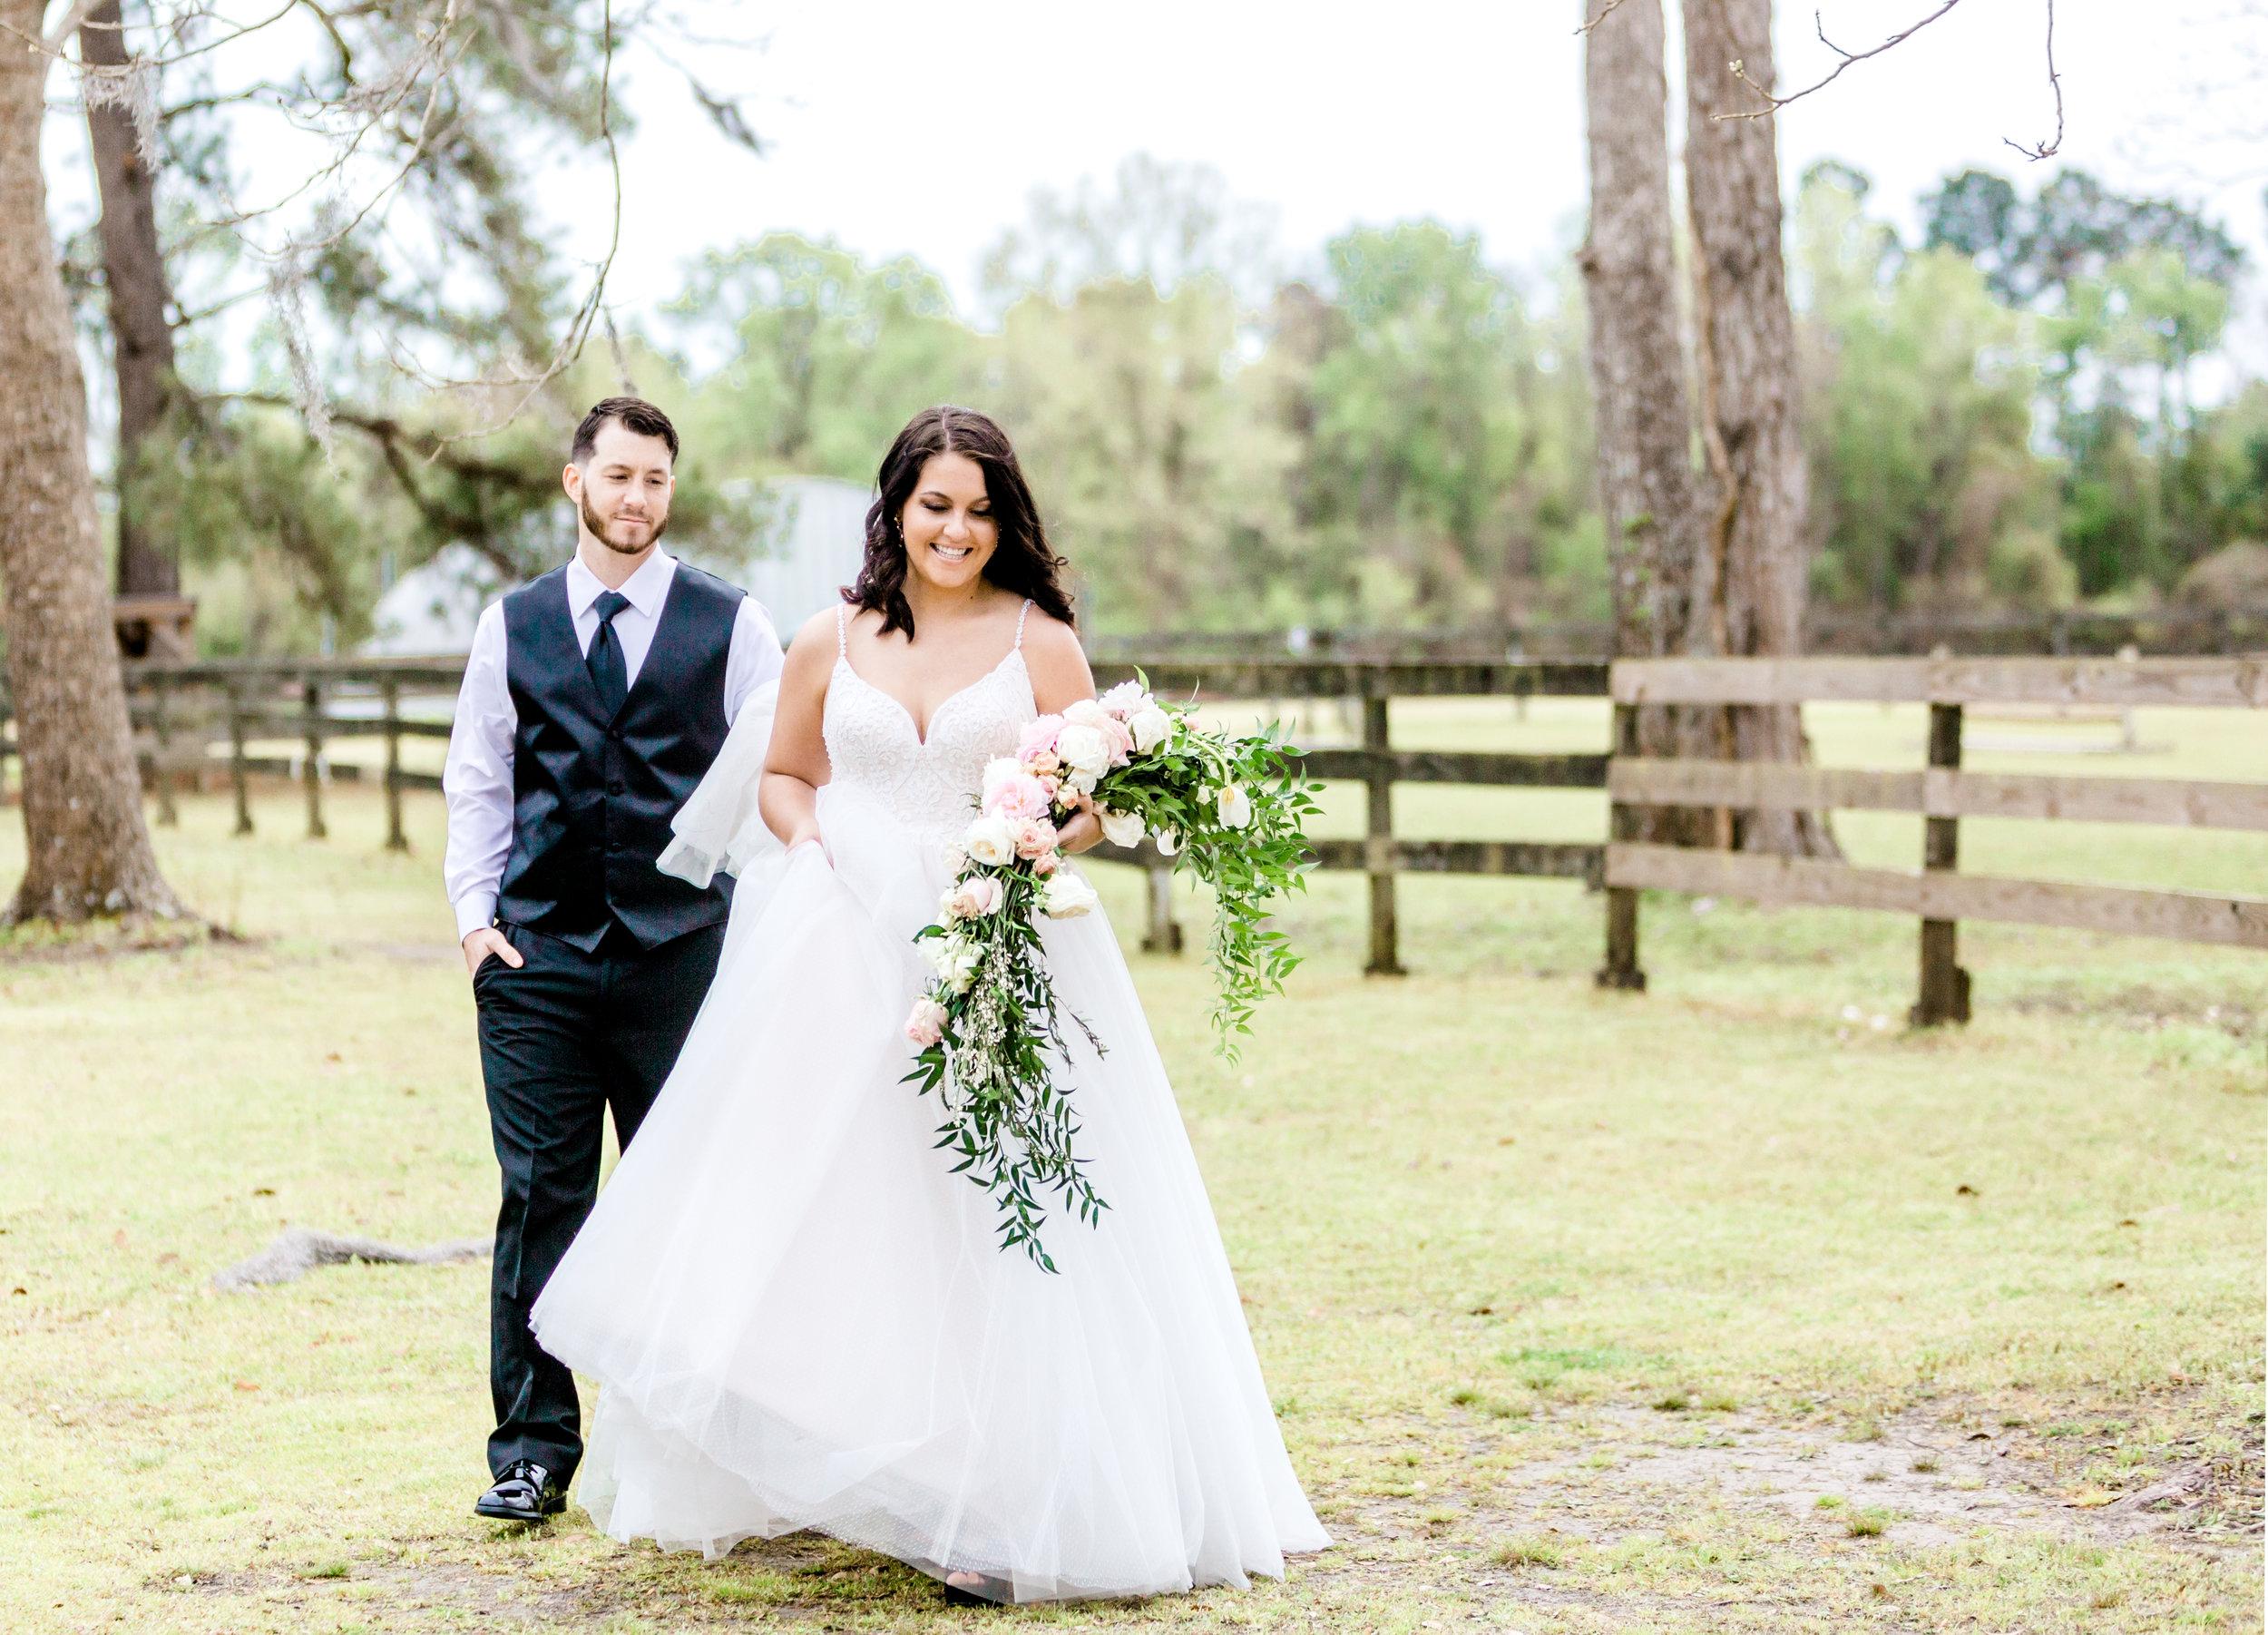 Wedding-photo Royal-Decor Events-by-Santana Corina-Silva-photography-145.jpg